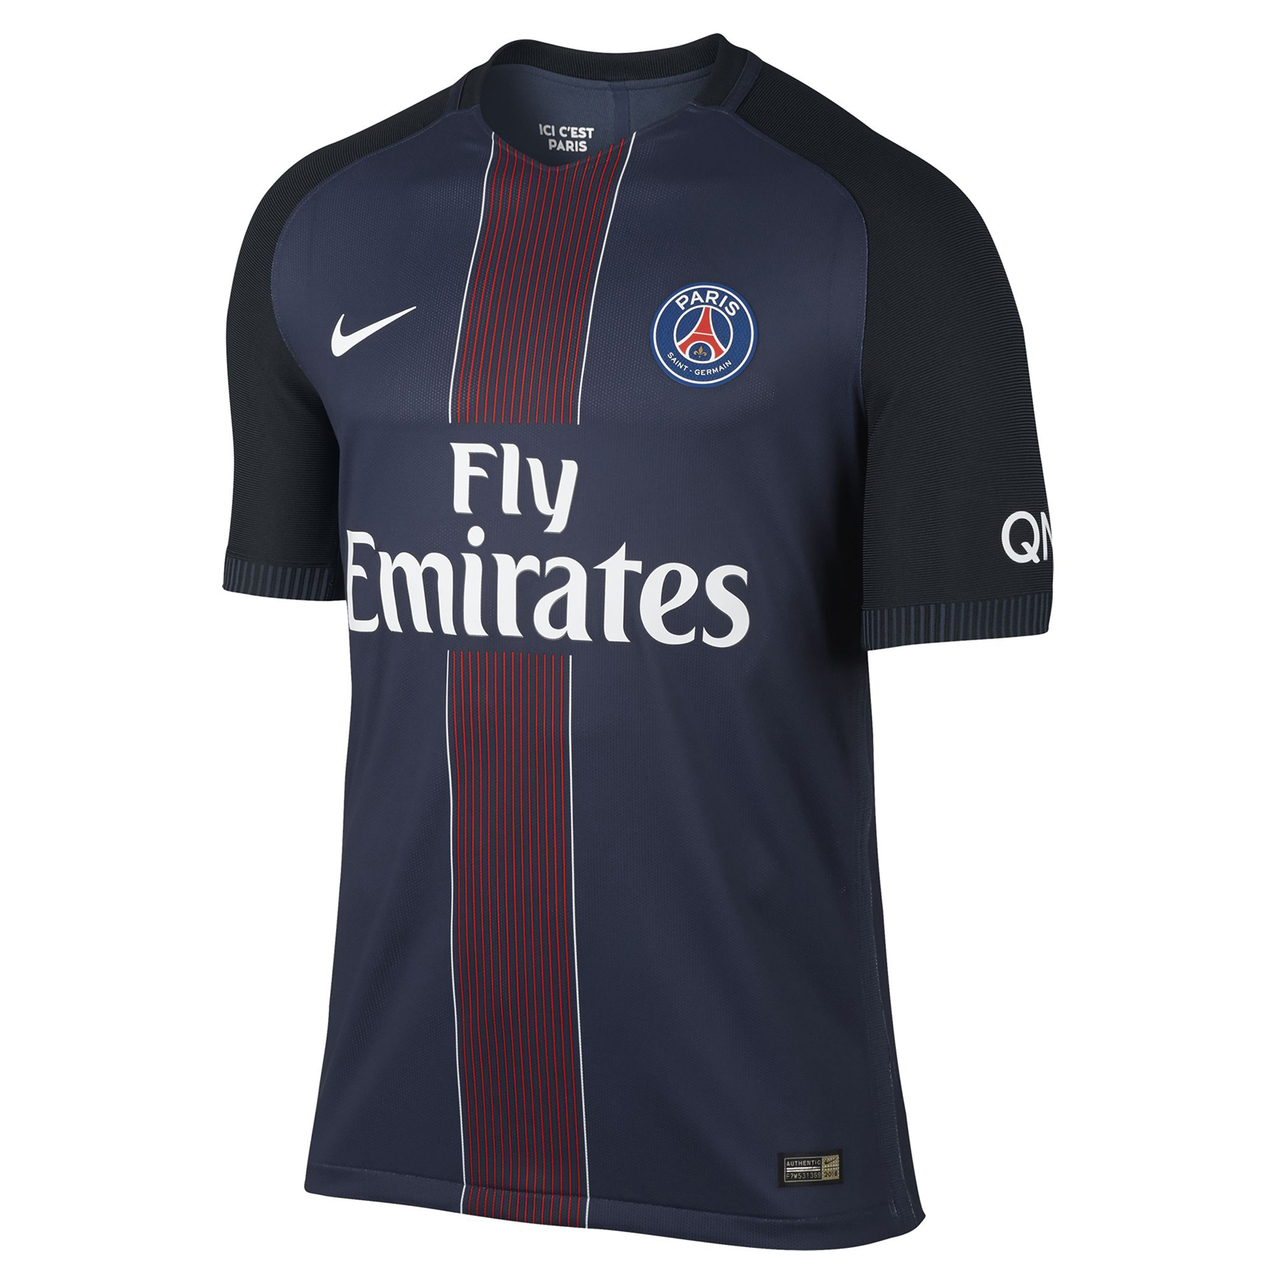 Camiseta del PSG para la temporada 2016/2017 (NIKE).